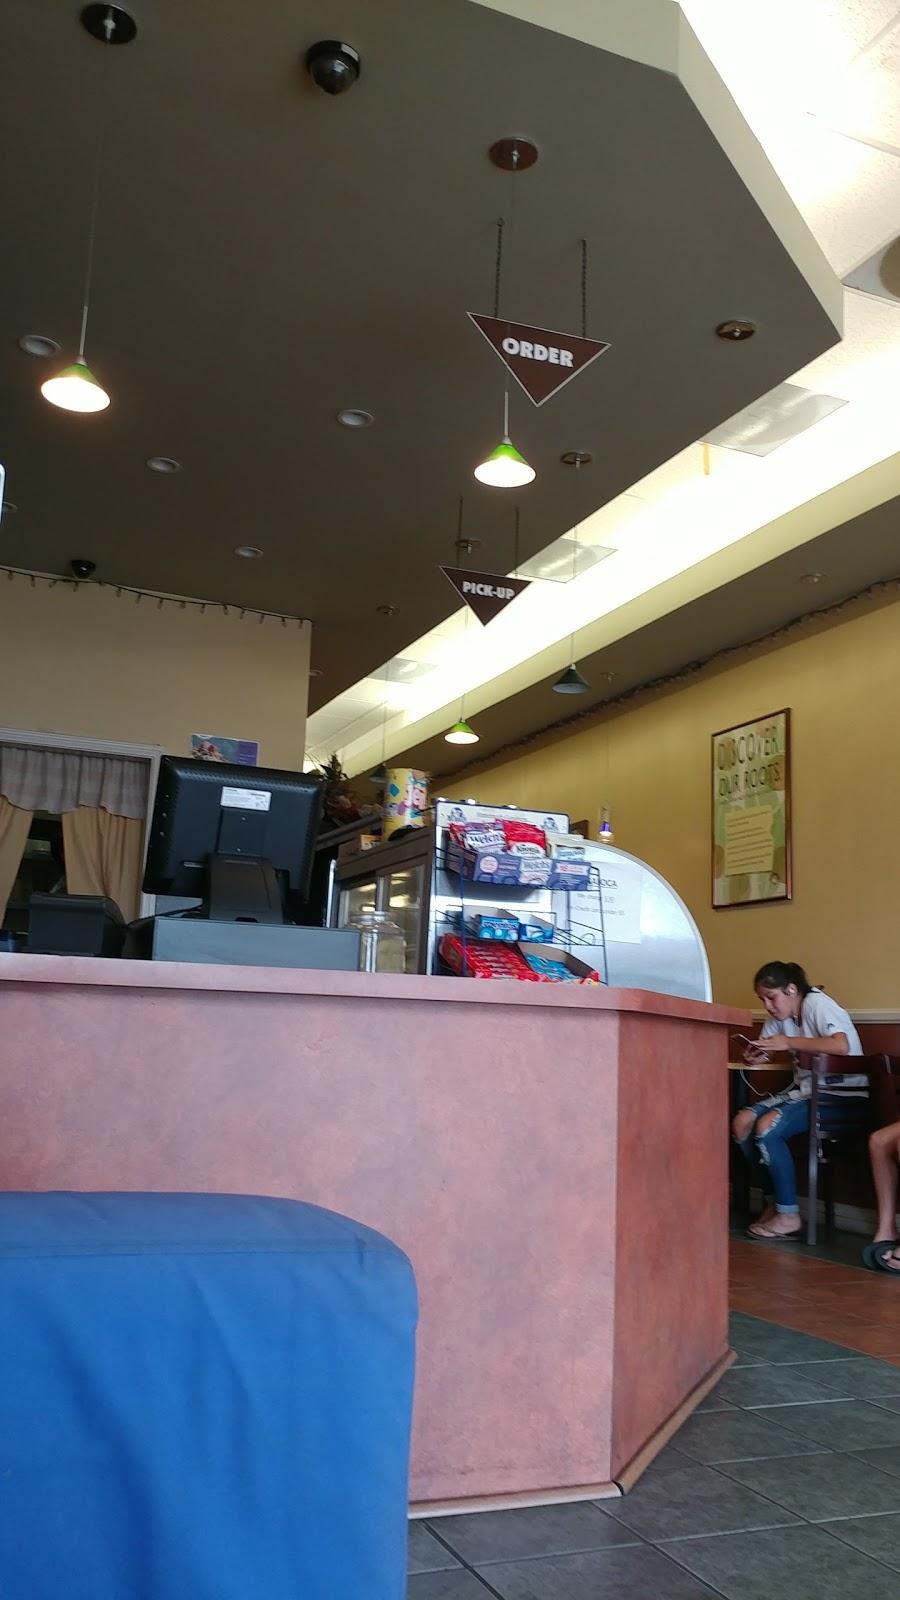 Boba Loca - cafe    Photo 4 of 6   Address: 15929 Pioneer Blvd, Norwalk, CA 90650, USA   Phone: (562) 924-6353